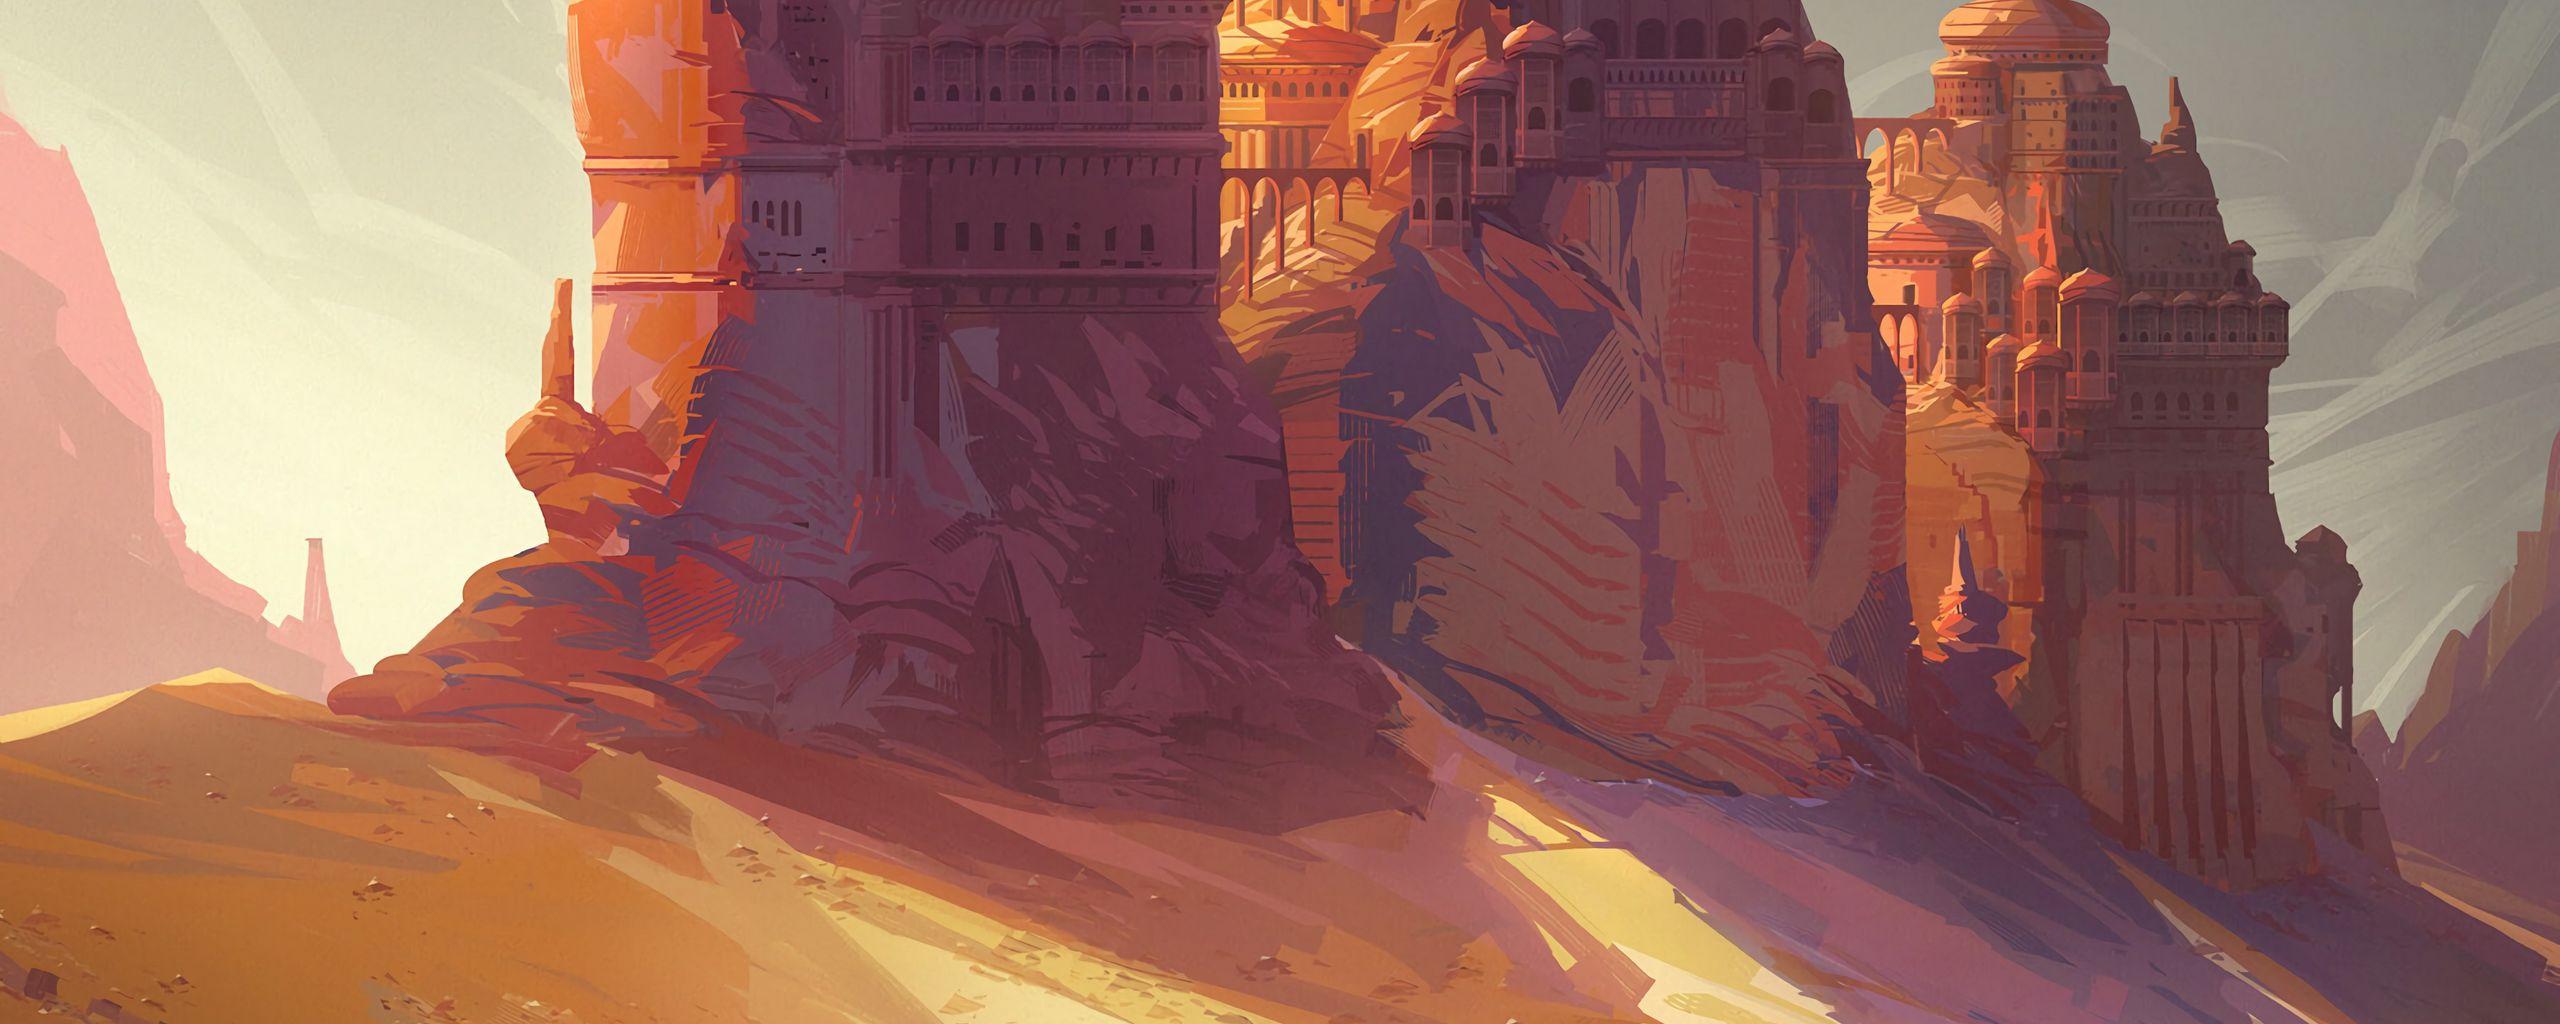 2560x1024 Wallpaper friends, adventure, castle, art